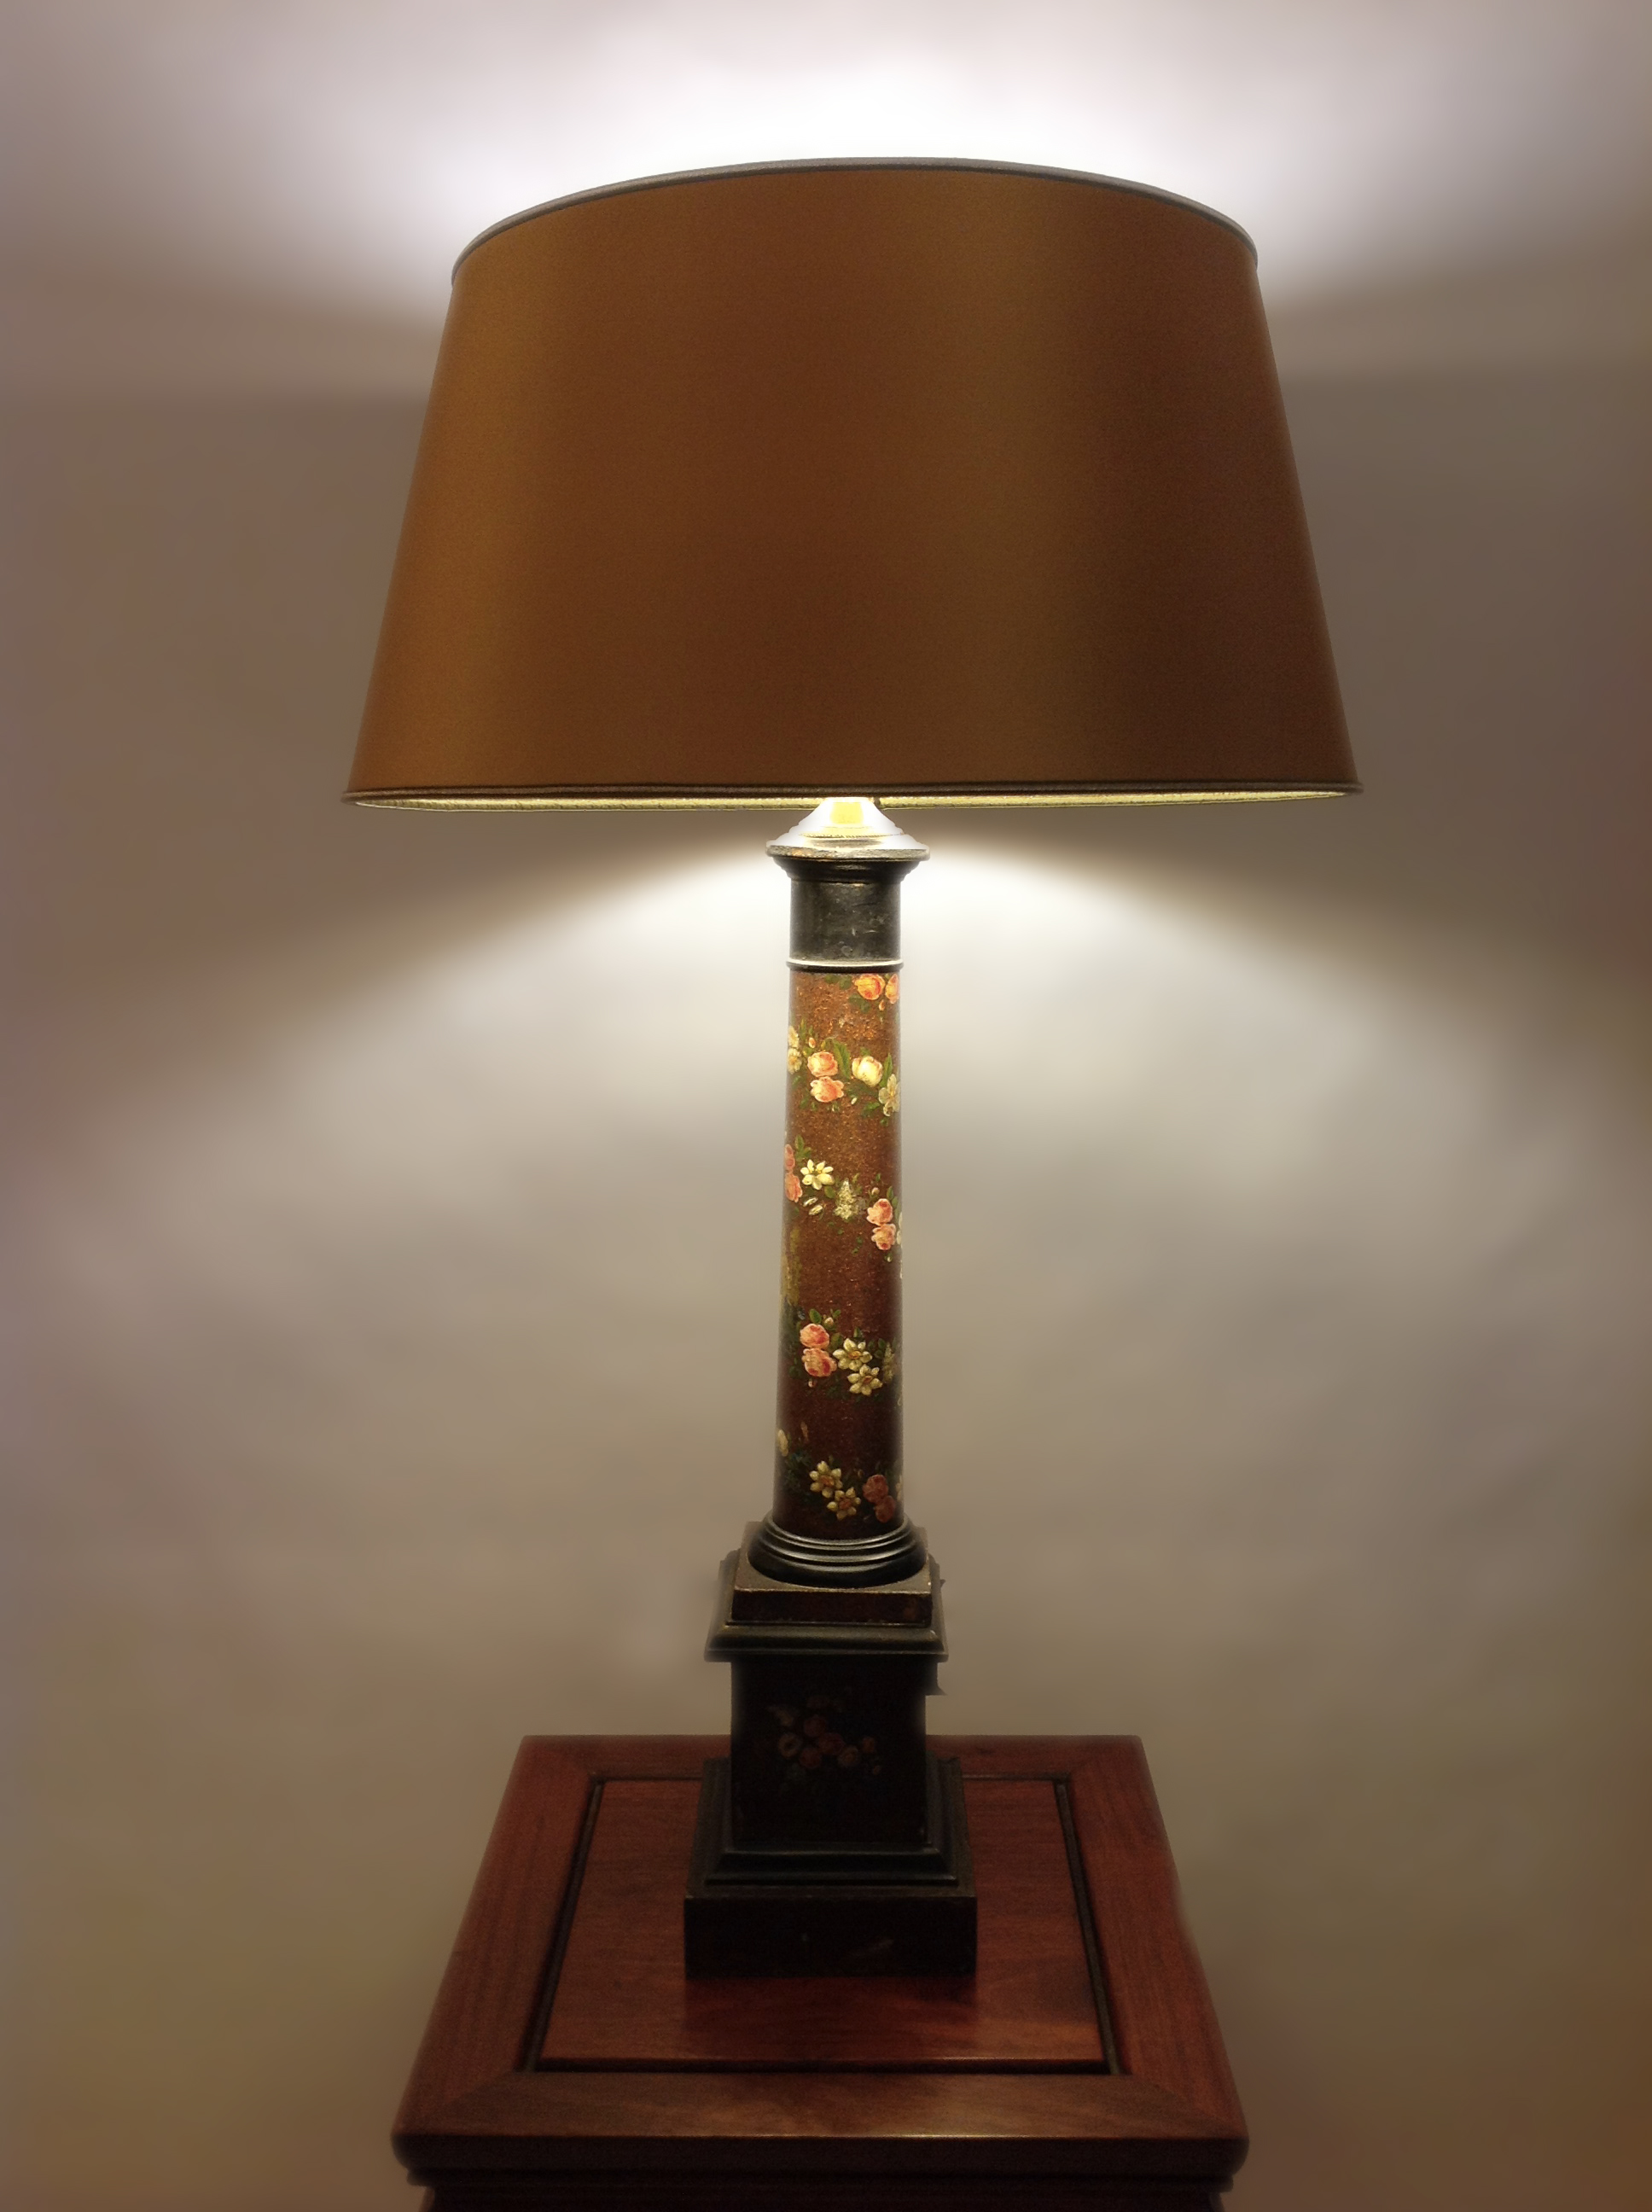 abat jour classique contrecoll horthense. Black Bedroom Furniture Sets. Home Design Ideas